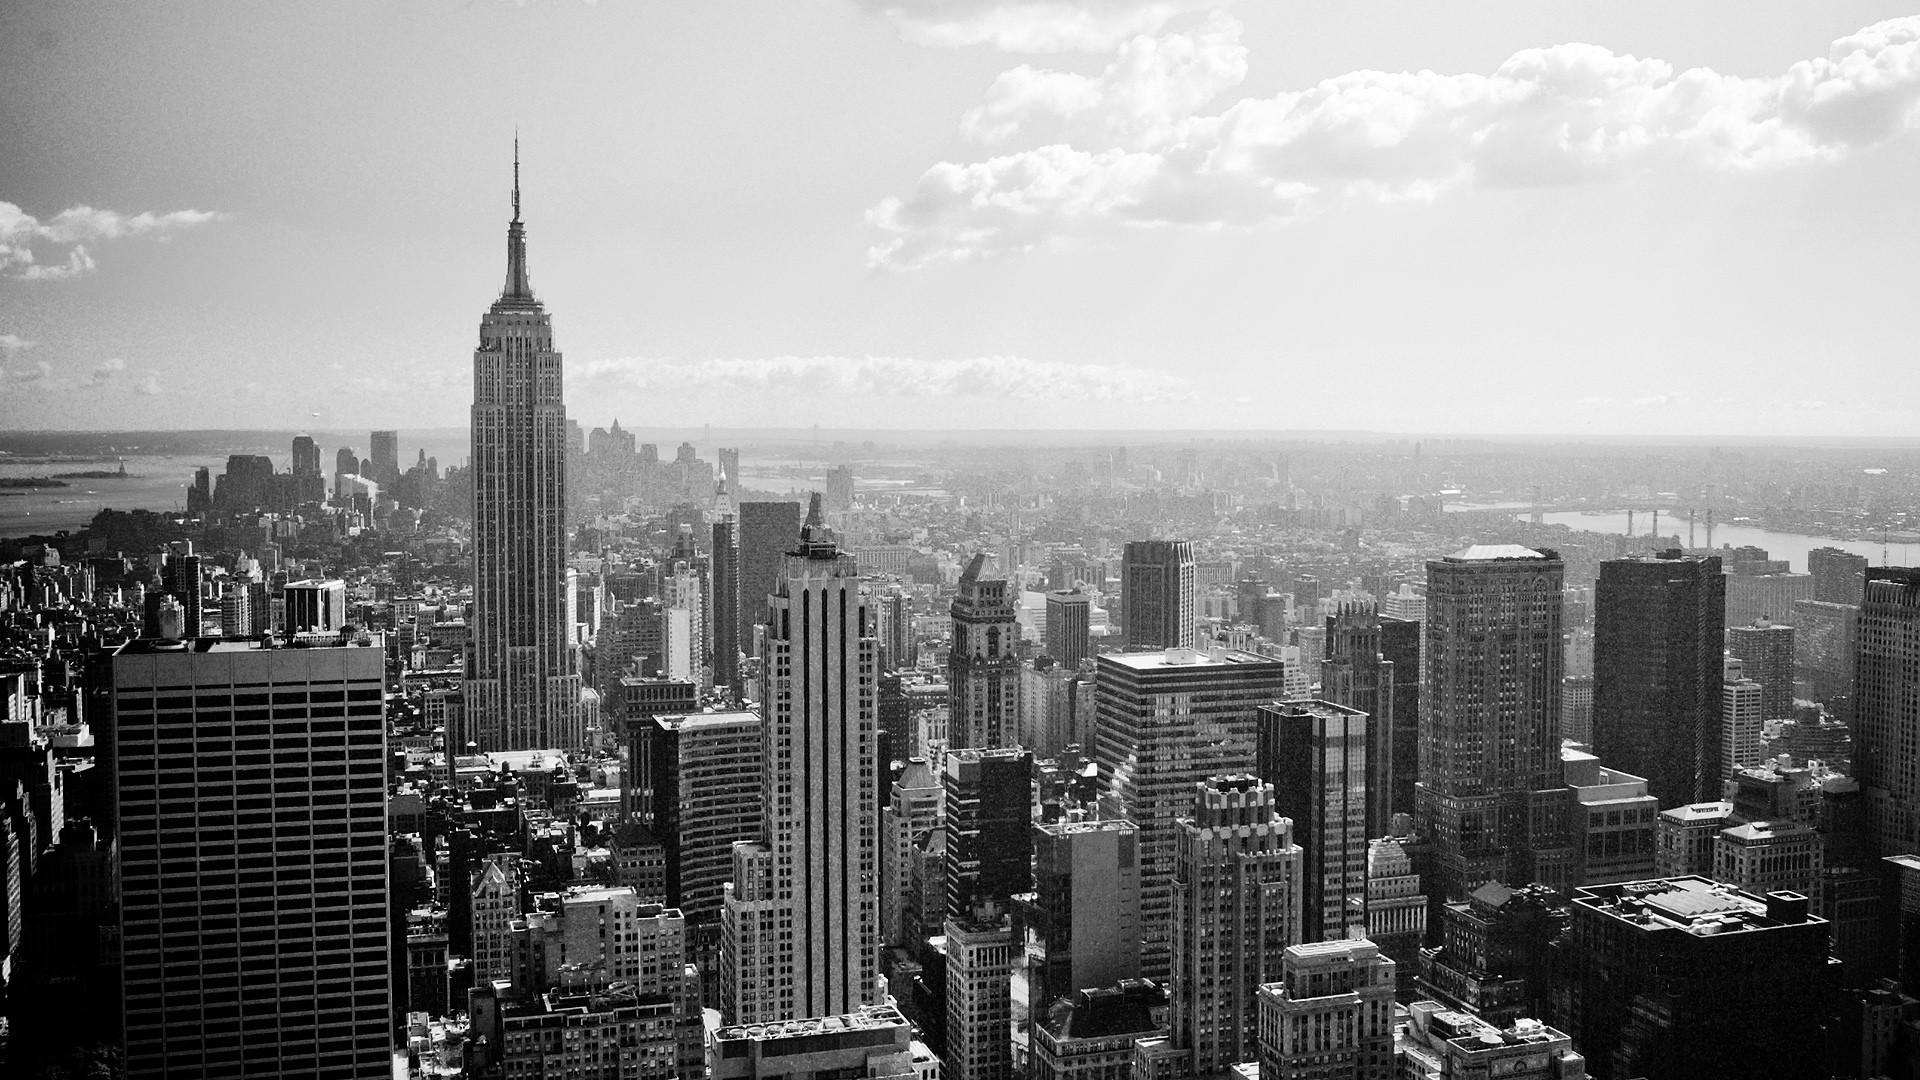 New York 1080p Wallpaper 1920x1080